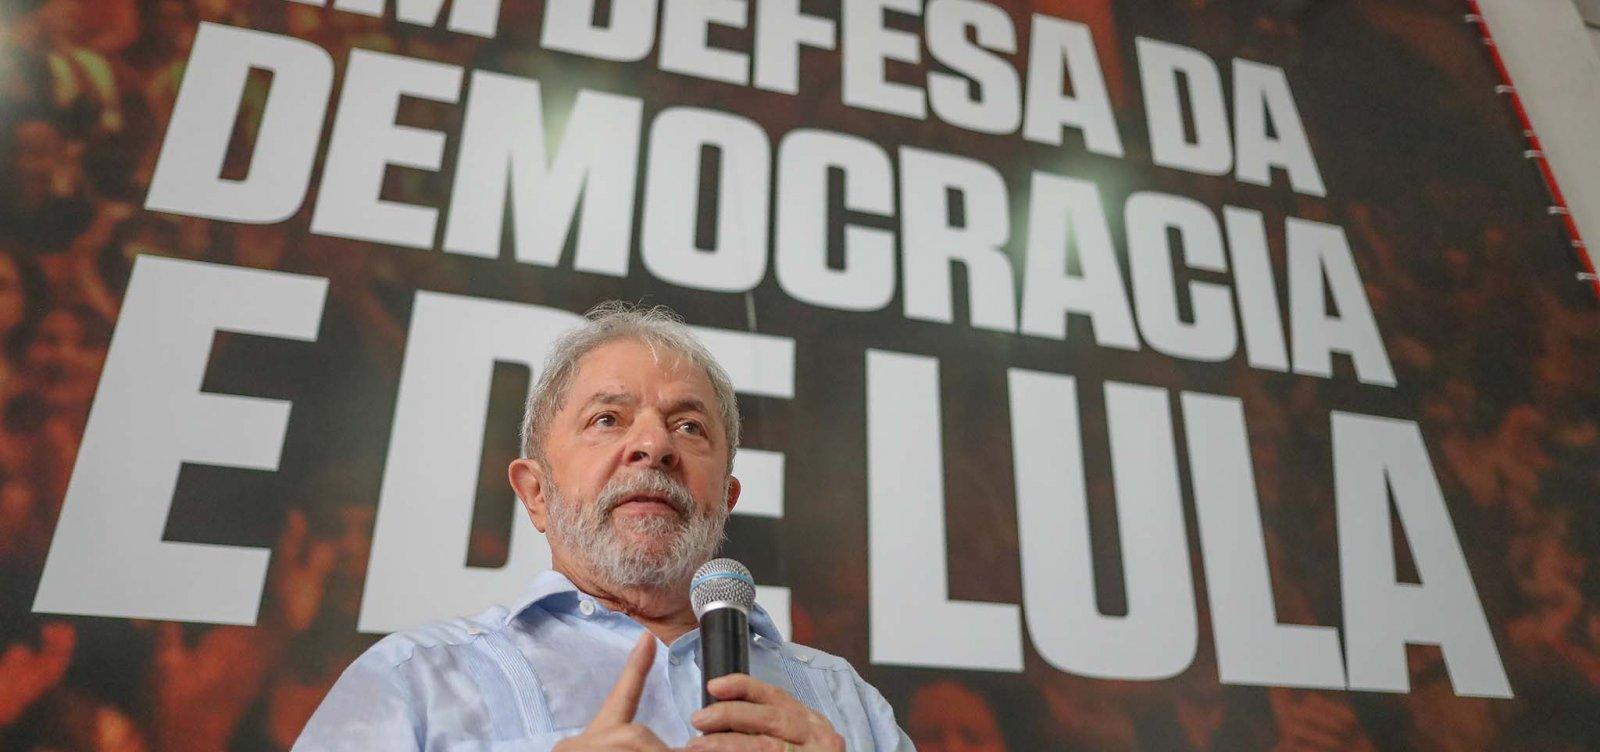 [Defesa avalia desistir de pedido de soltura para evitar que STF discuta elegibilidade de Lula]